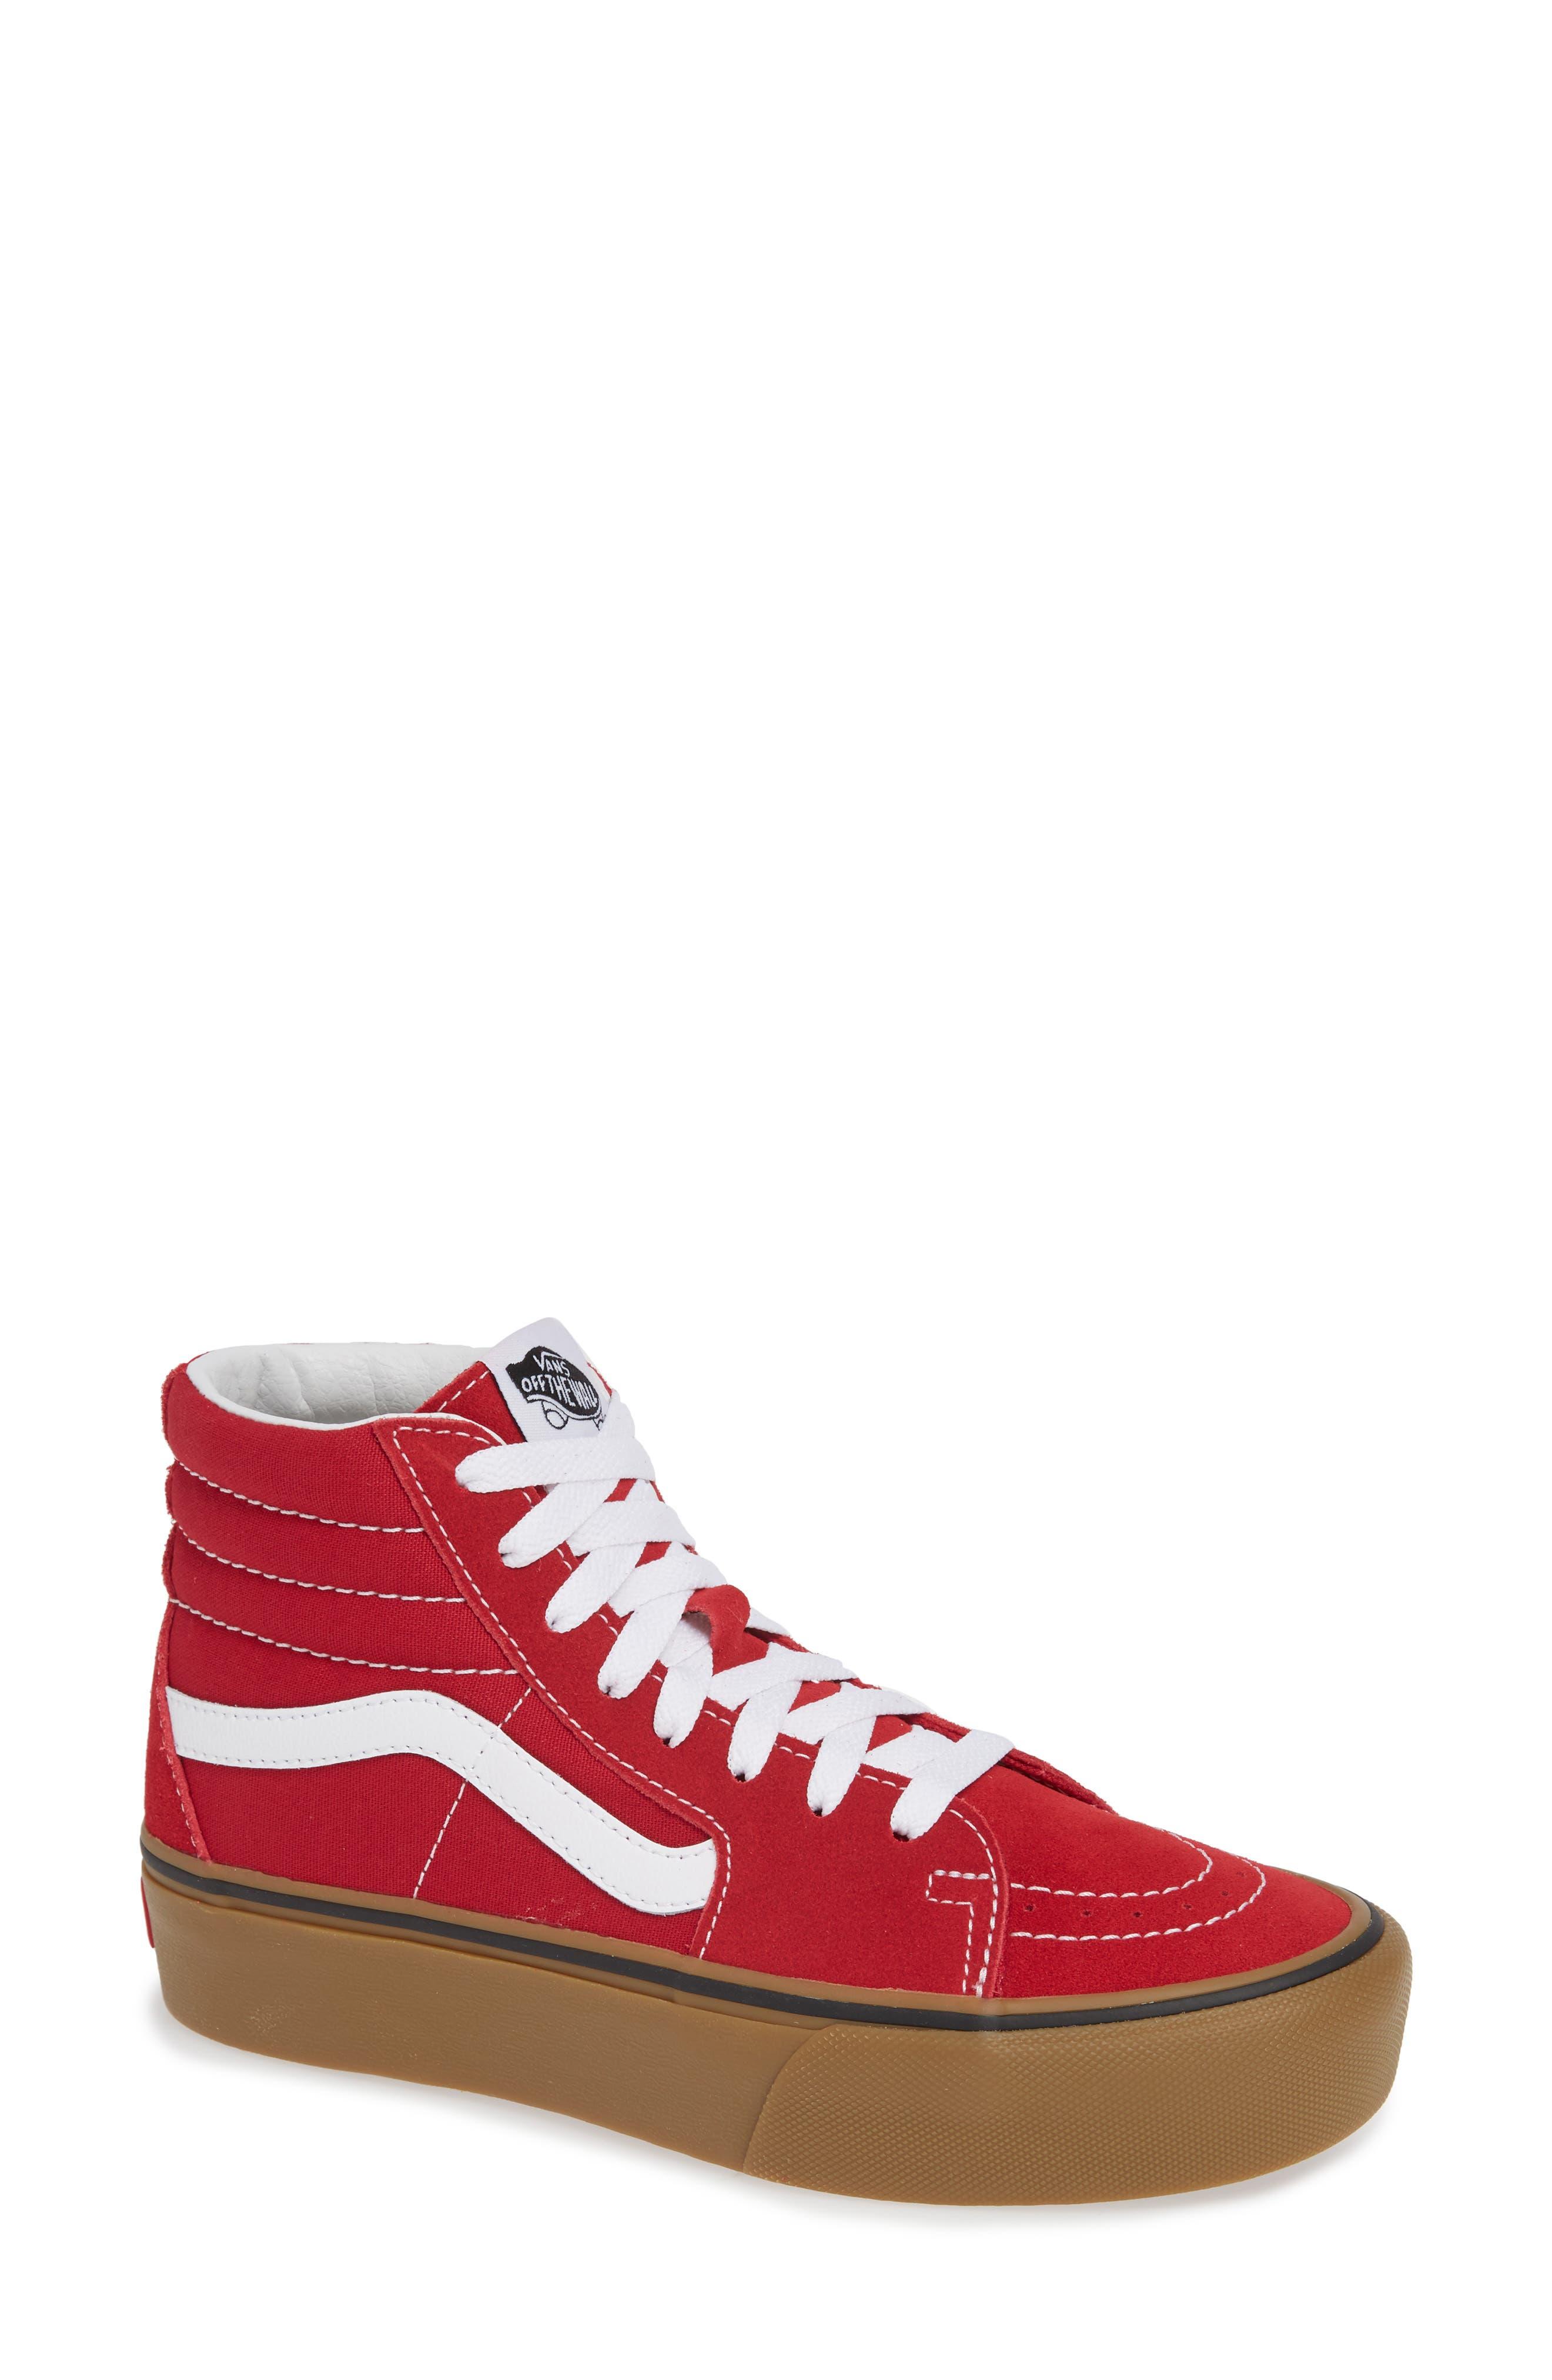 Sk8-Hi Platform Sneaker,                             Main thumbnail 1, color,                             SCOOTER/ TRUE WHITE